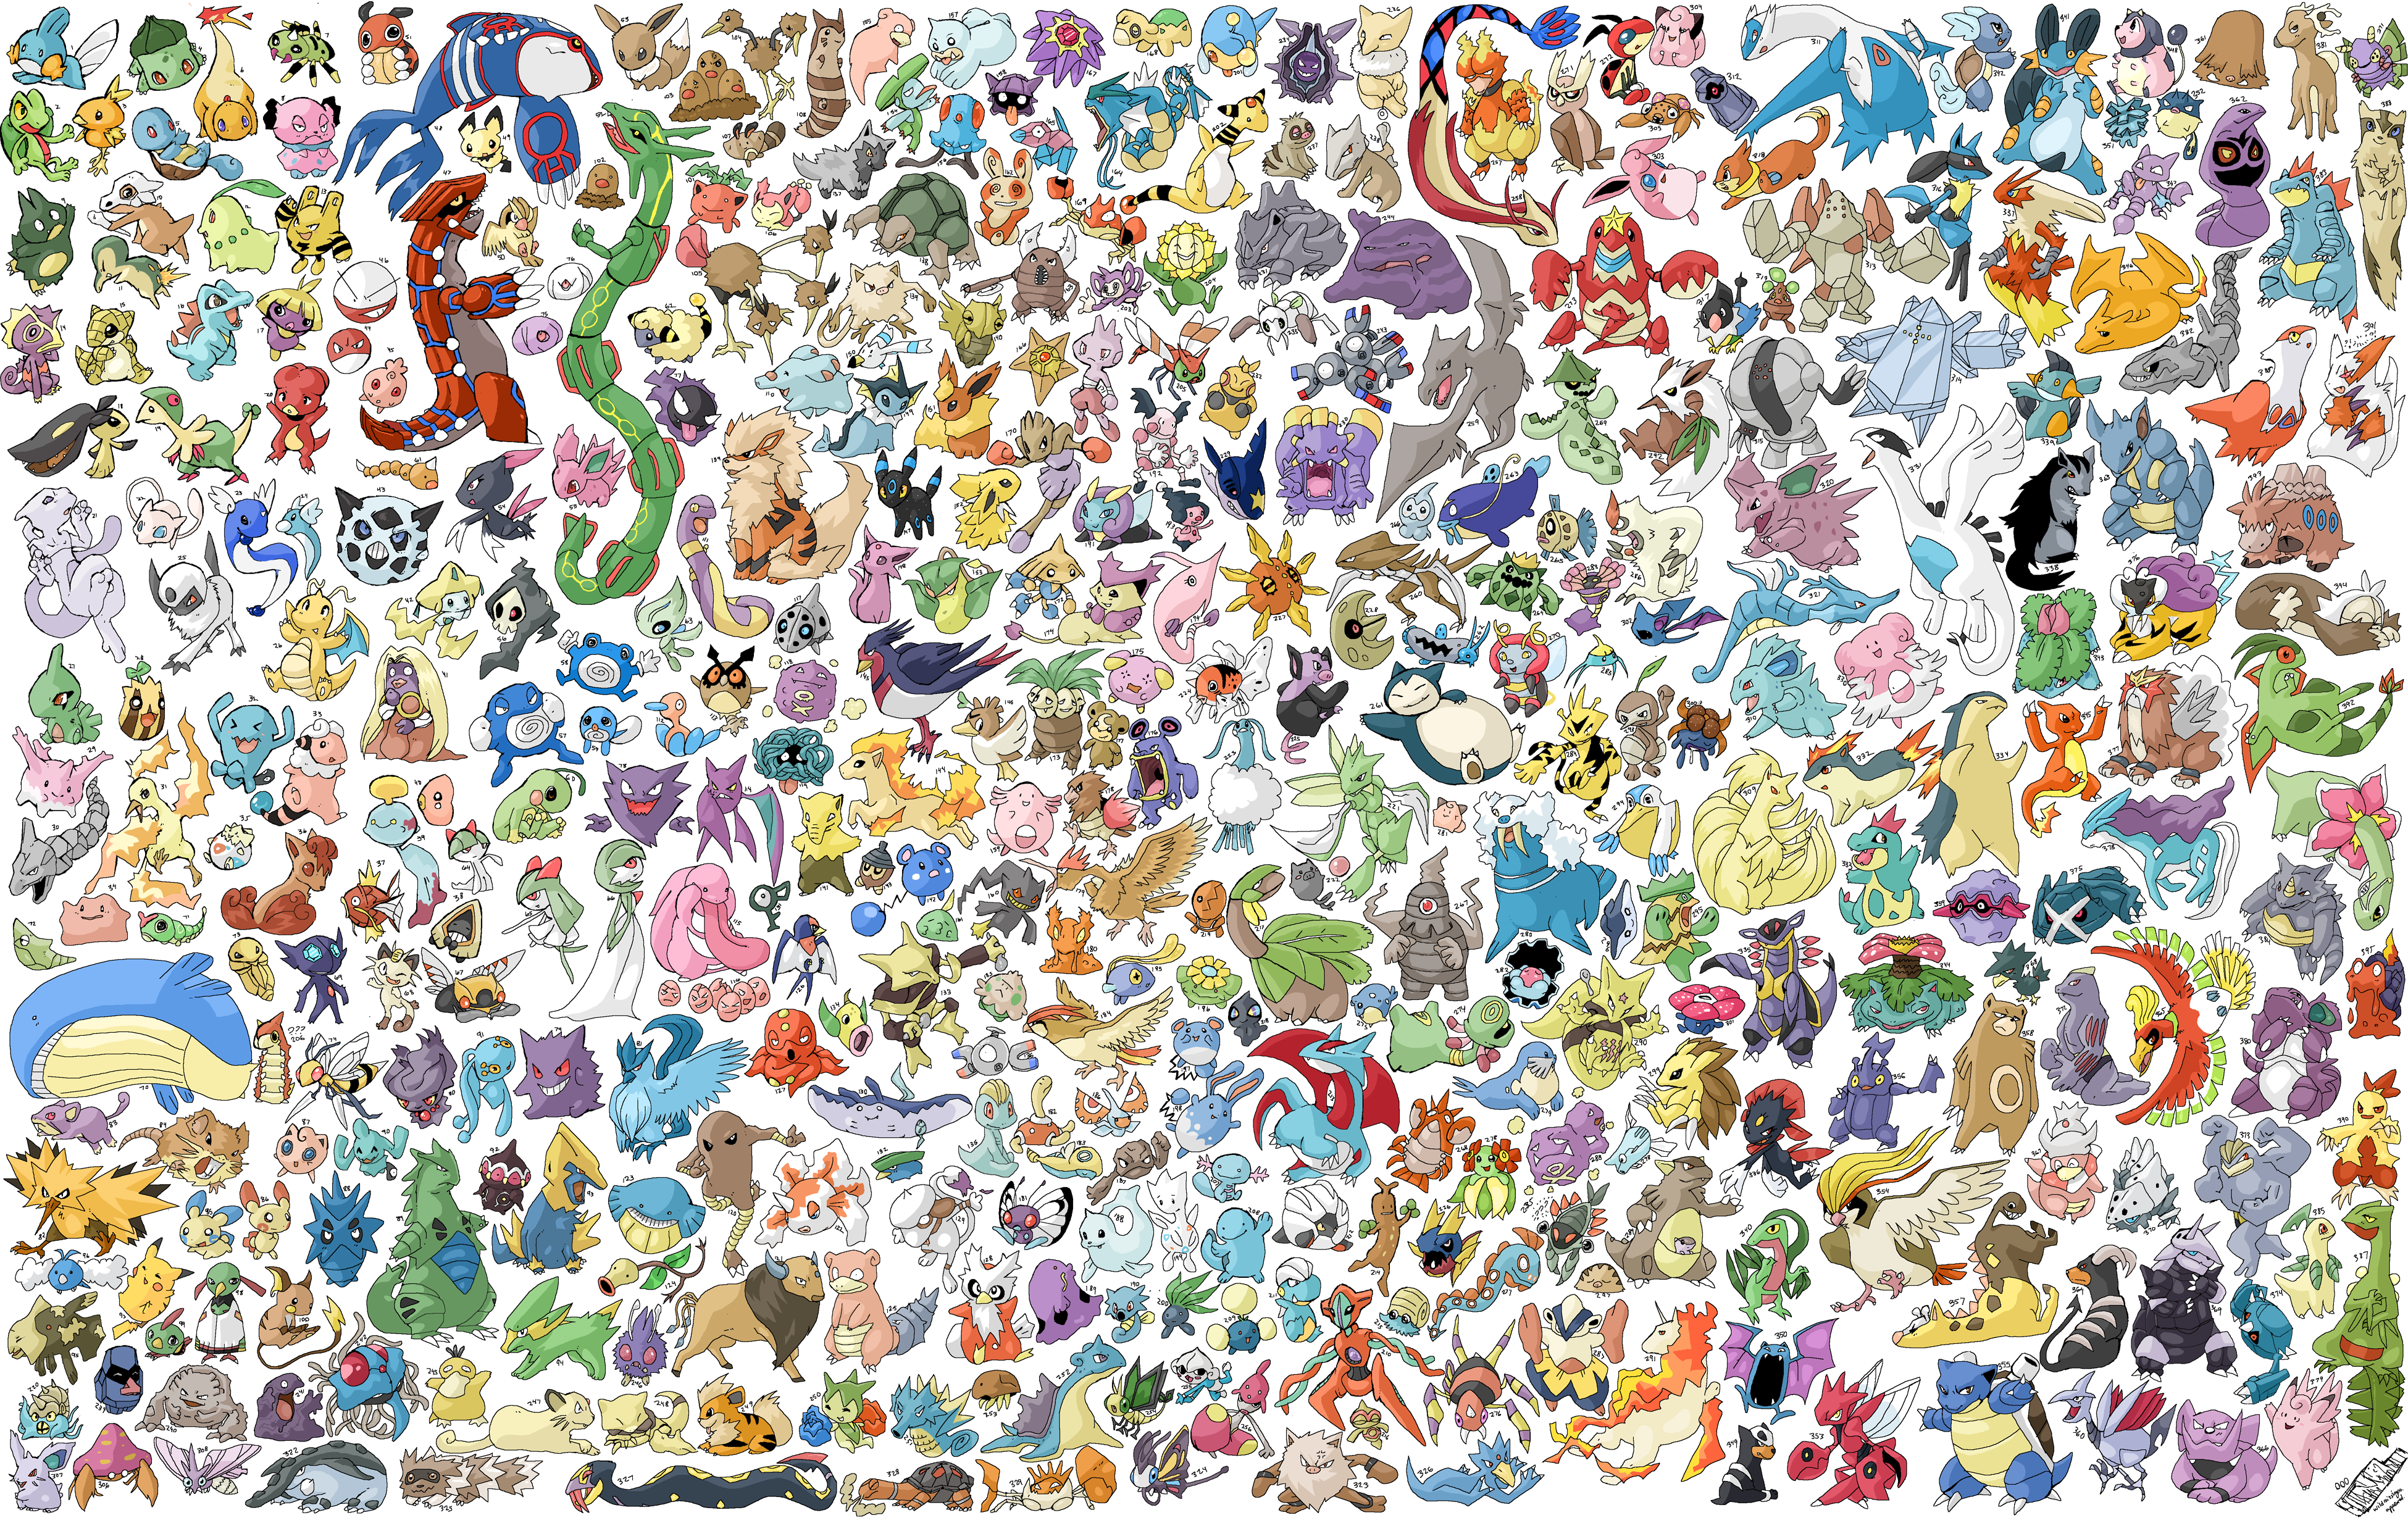 Cool Pokemon Backgrounds wallpaper Cool Pokemon Backgrounds hd 3900x2459